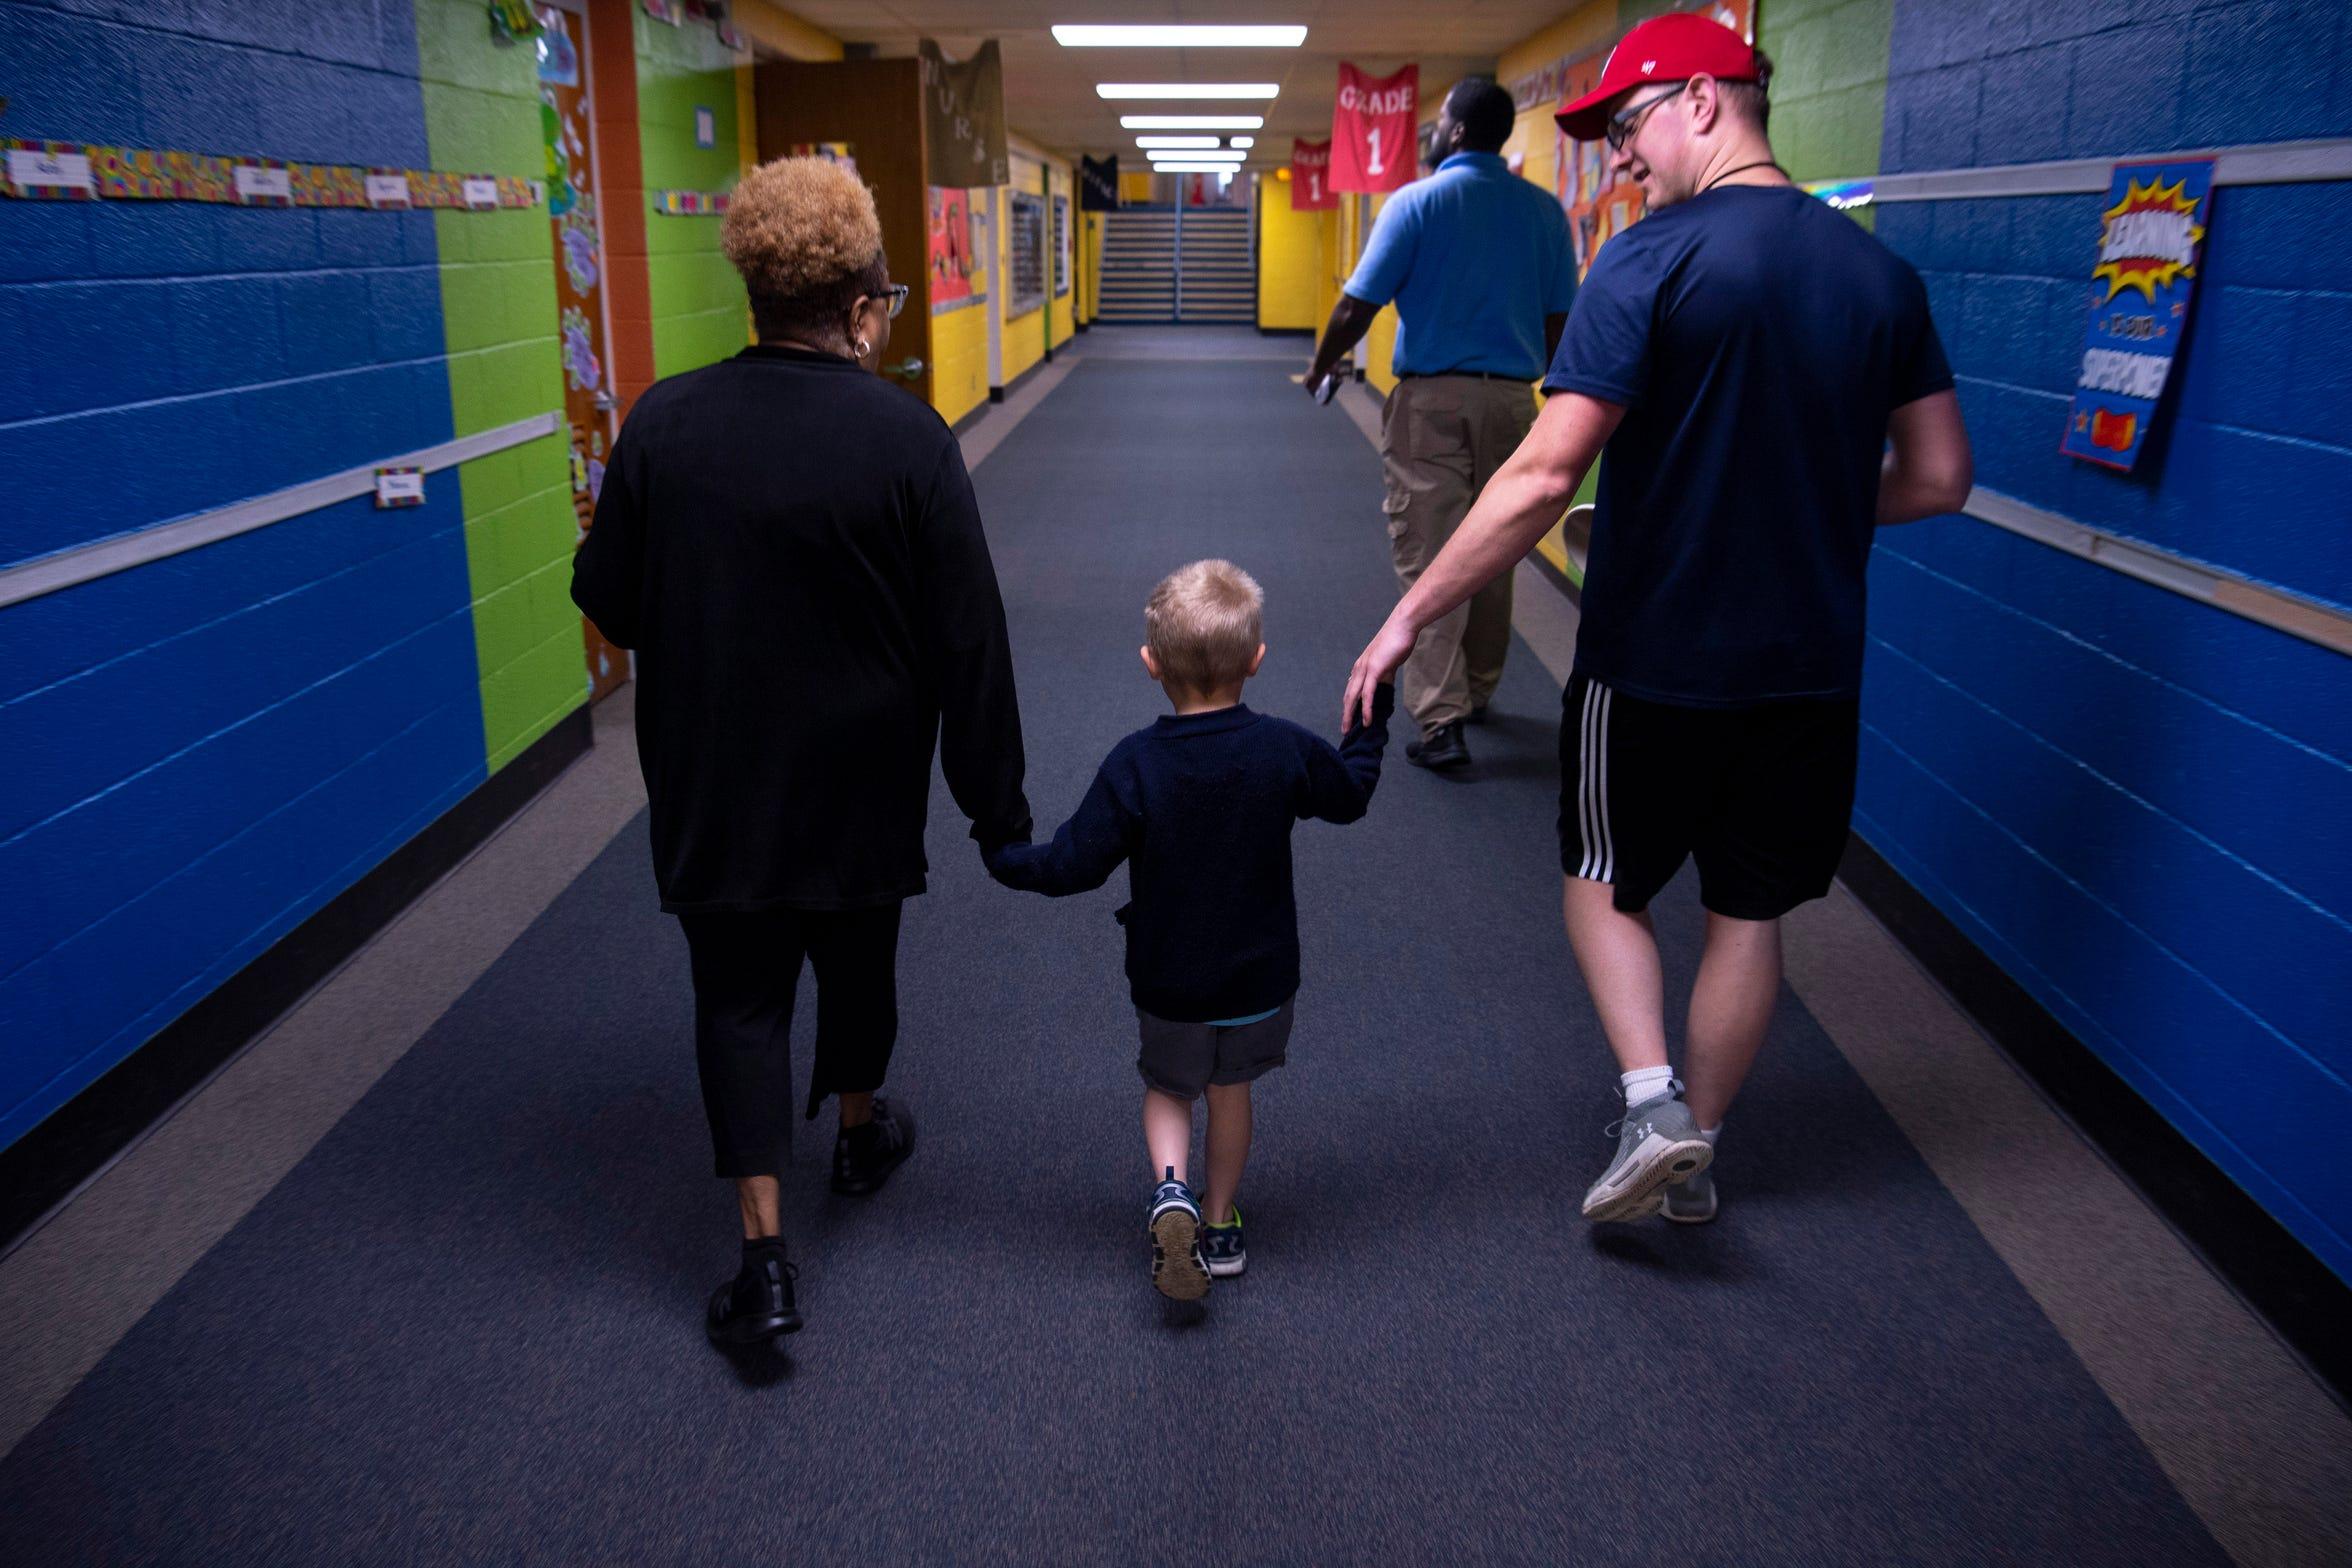 Pam Decker and Jeremy Rittenbery, PE teacher, walk kindergartner Gabriel Bennet to the nurses office after he took a fall during Joshua Academy's field day Friday, May 10, 2019.